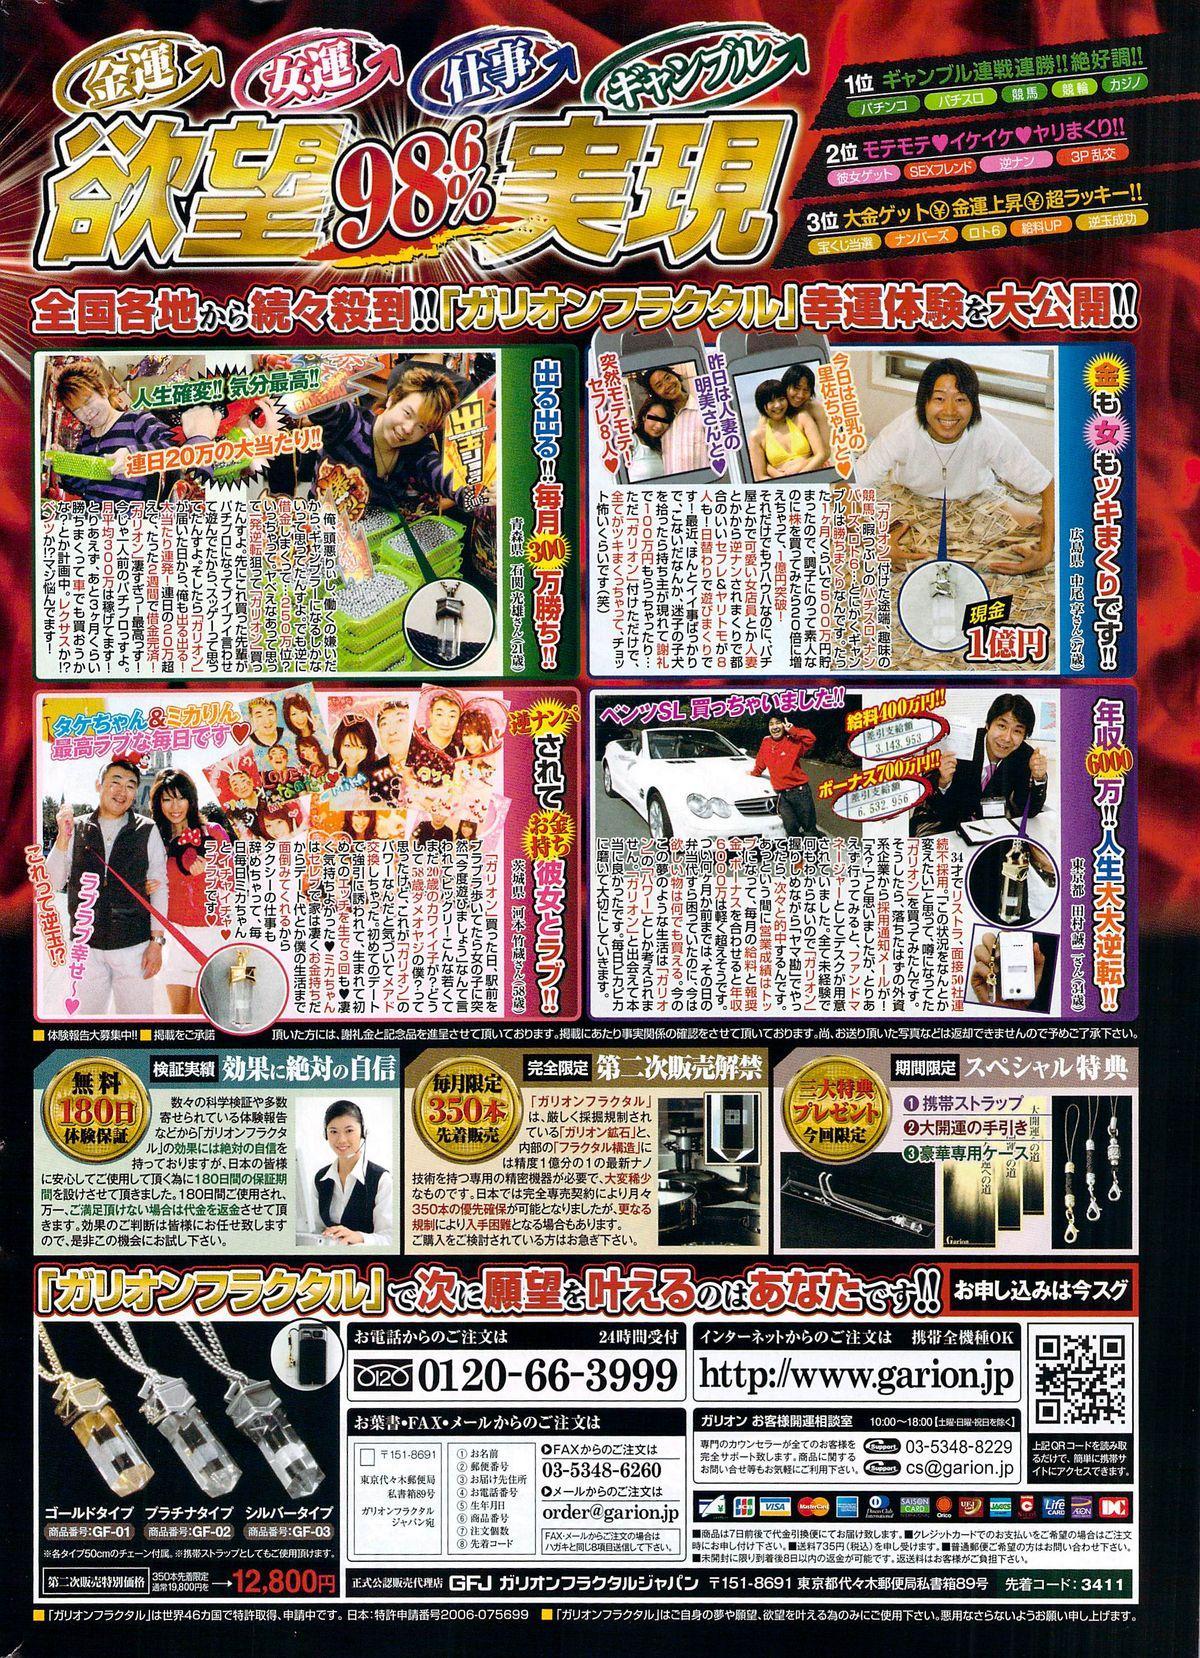 Monthly Vitaman 2009-08 302